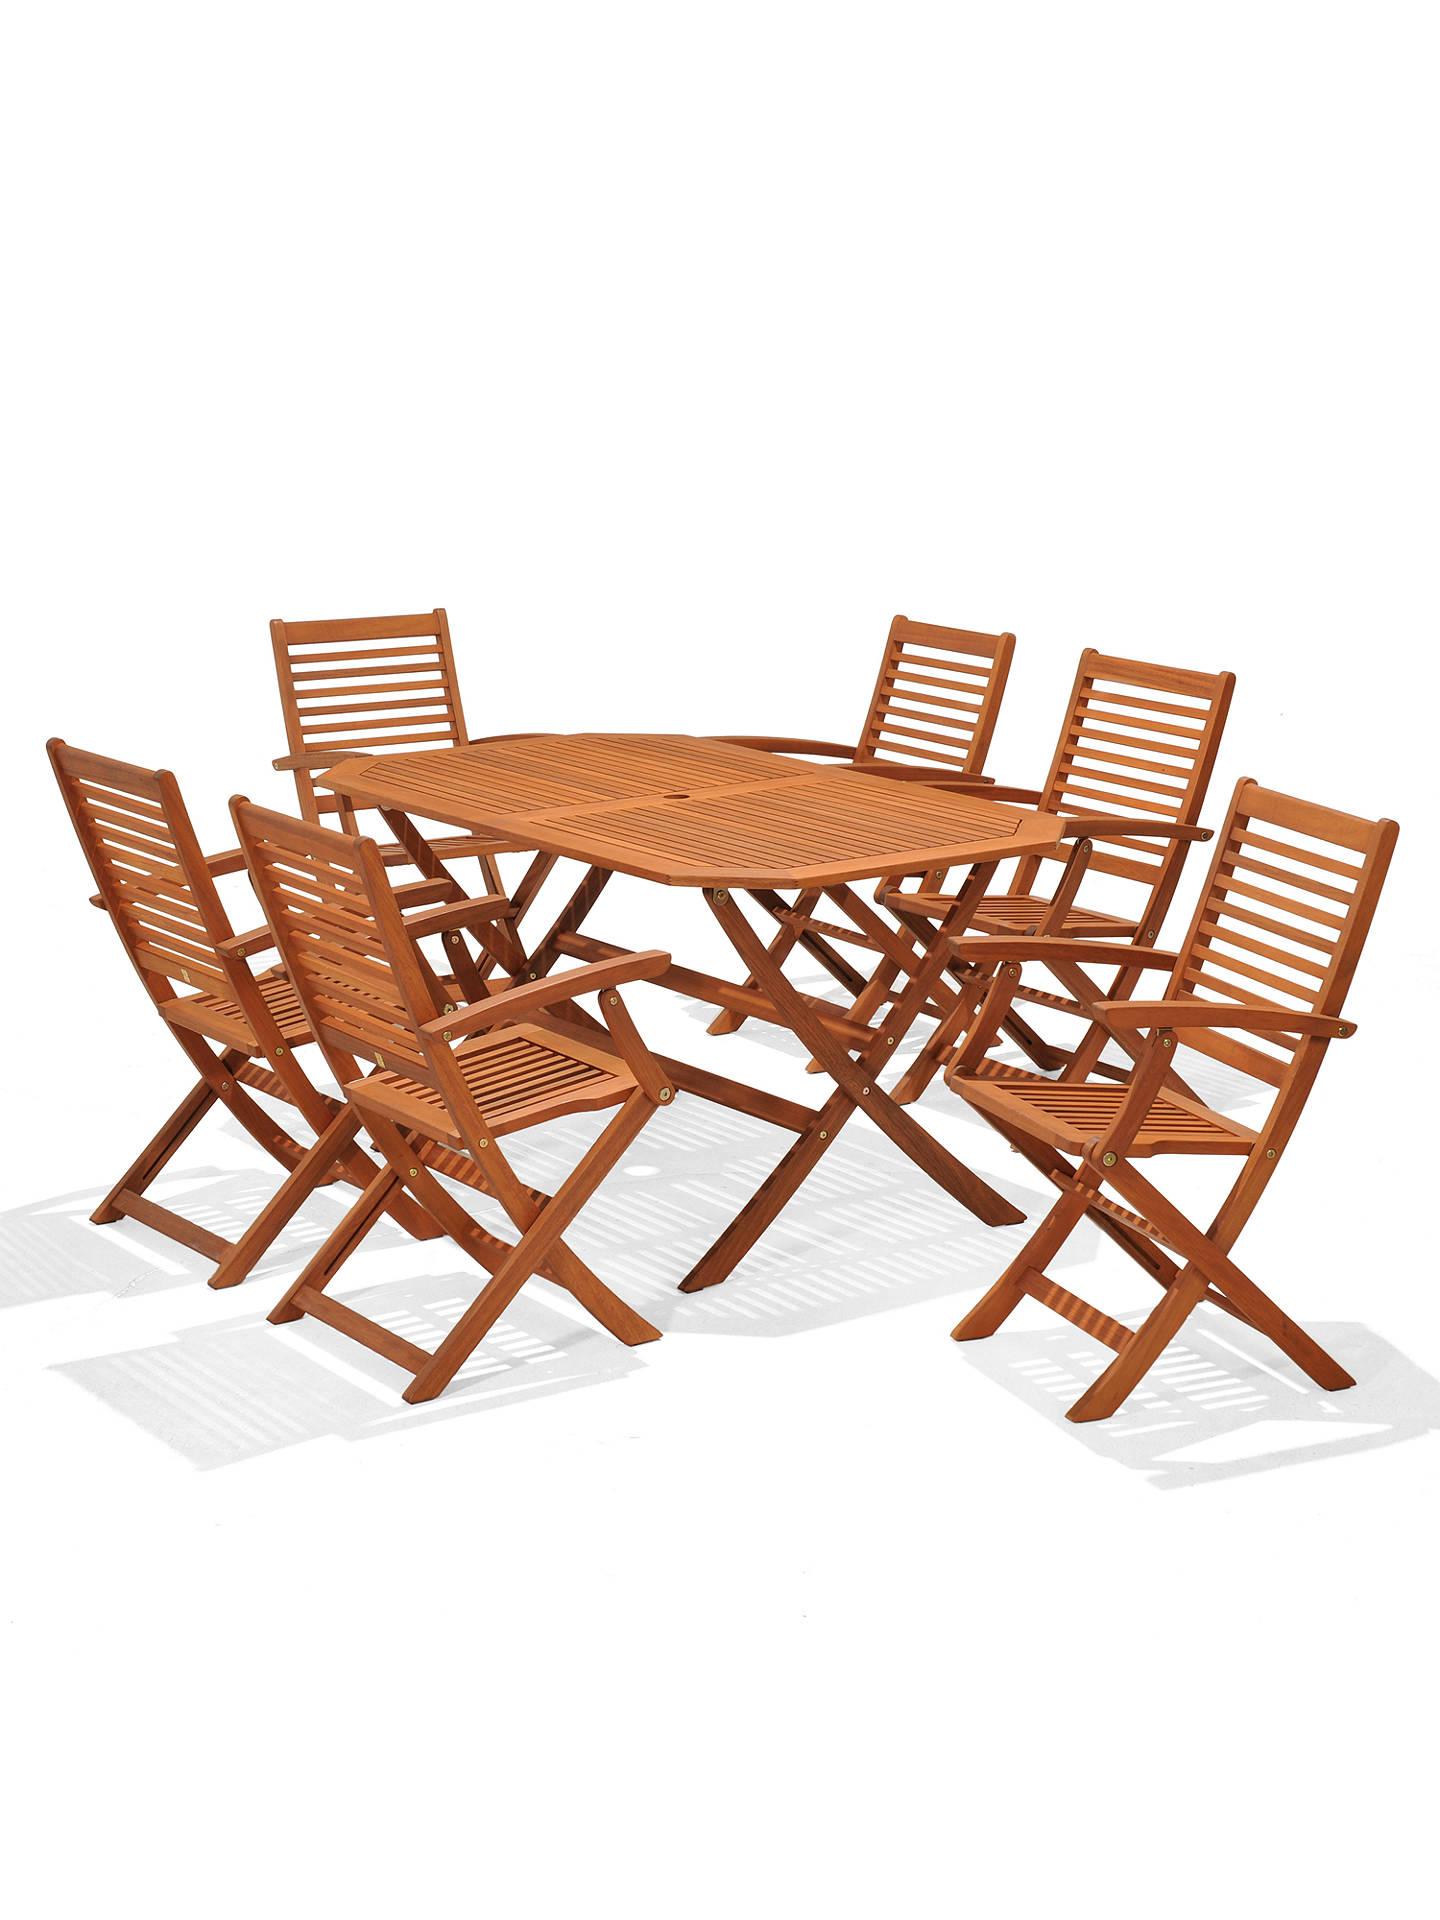 John Lewis Venice Garden Gateleg Table 6 Folding Armchairs Fsc Certified Eucalyptus